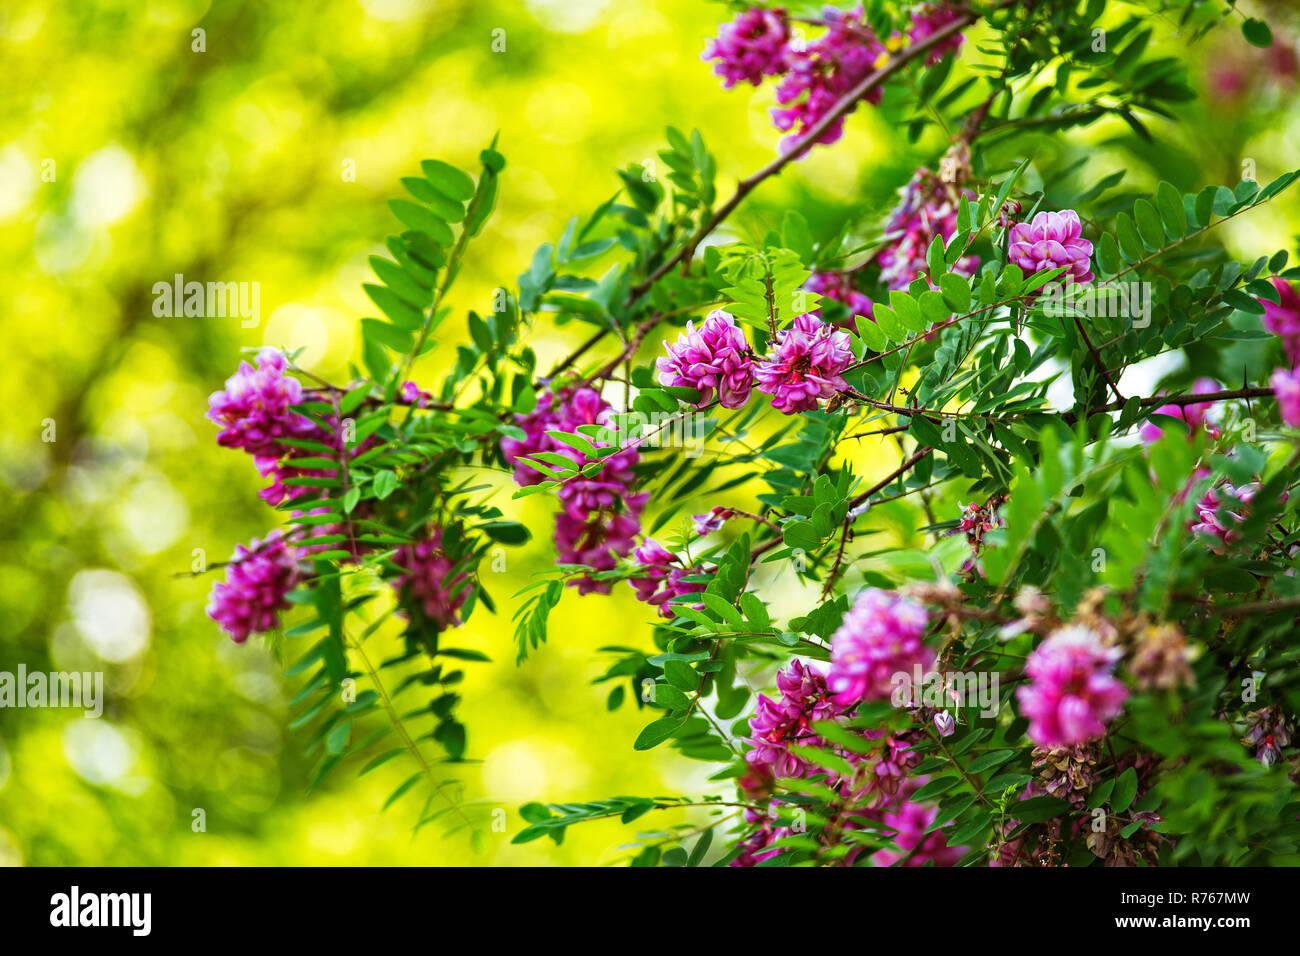 Purple Acacia Tree Blooming Pink Robinia Flowers Stock Photo